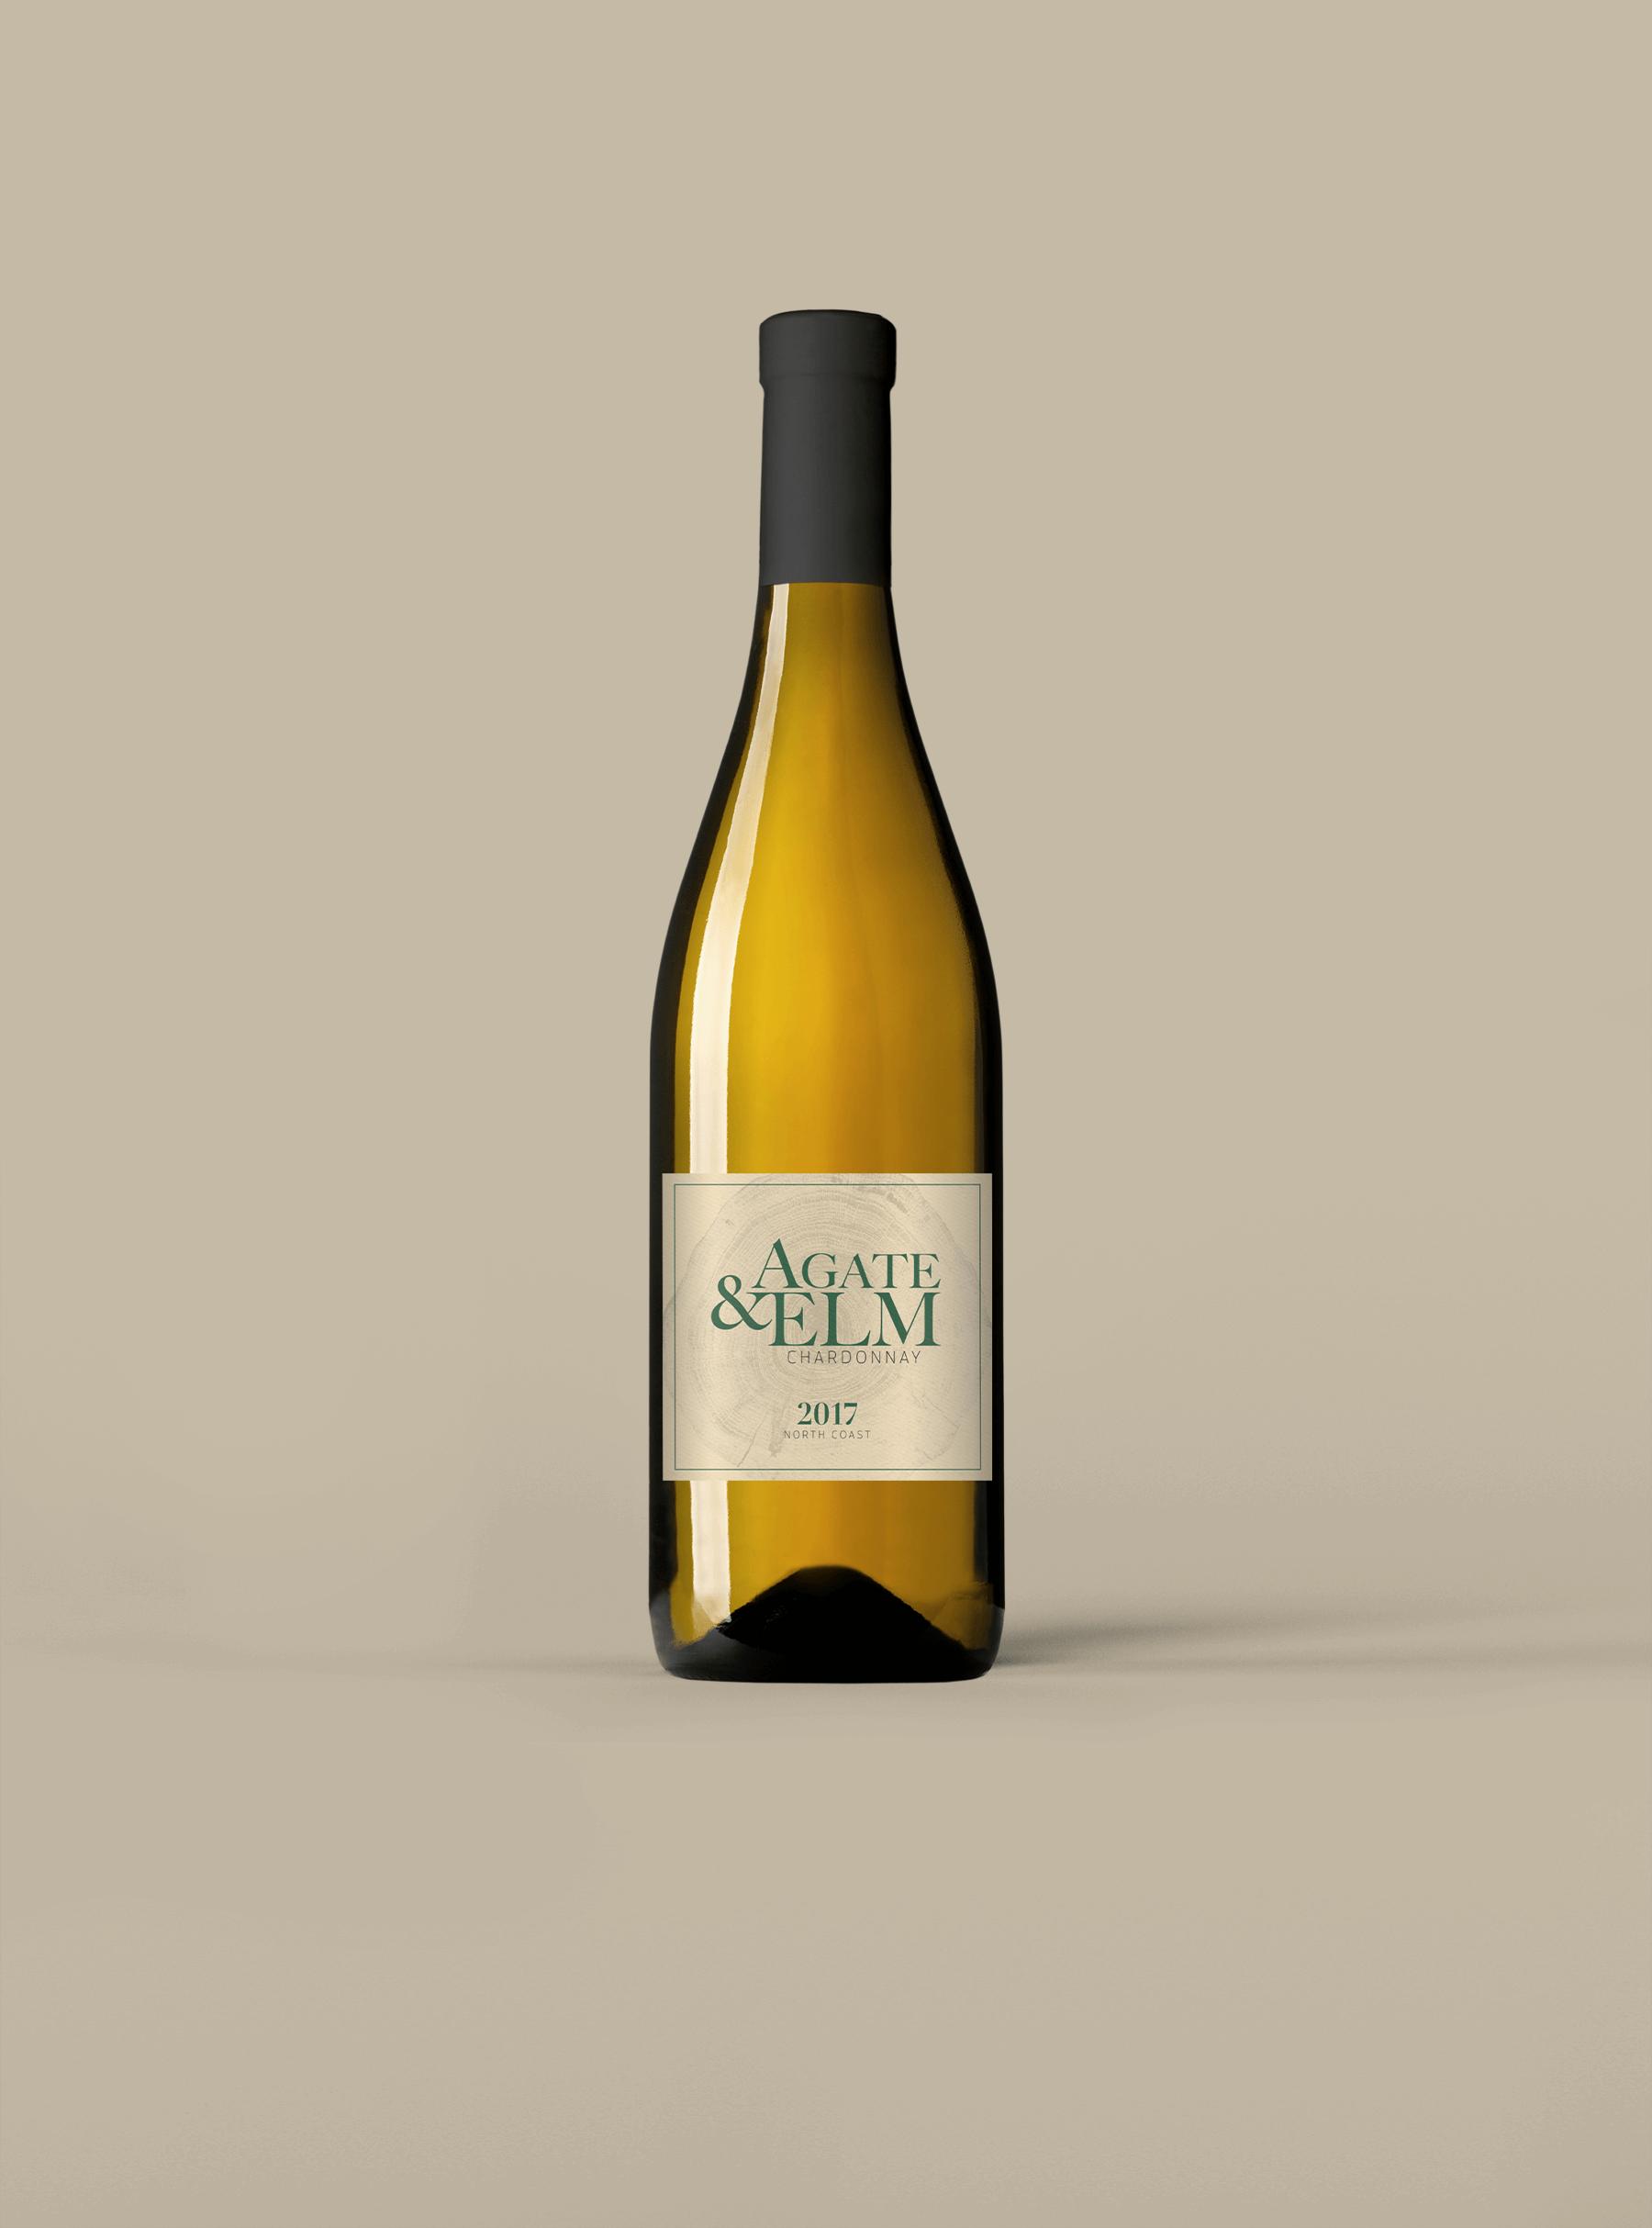 Agate & Elm North Coast Chardonnay